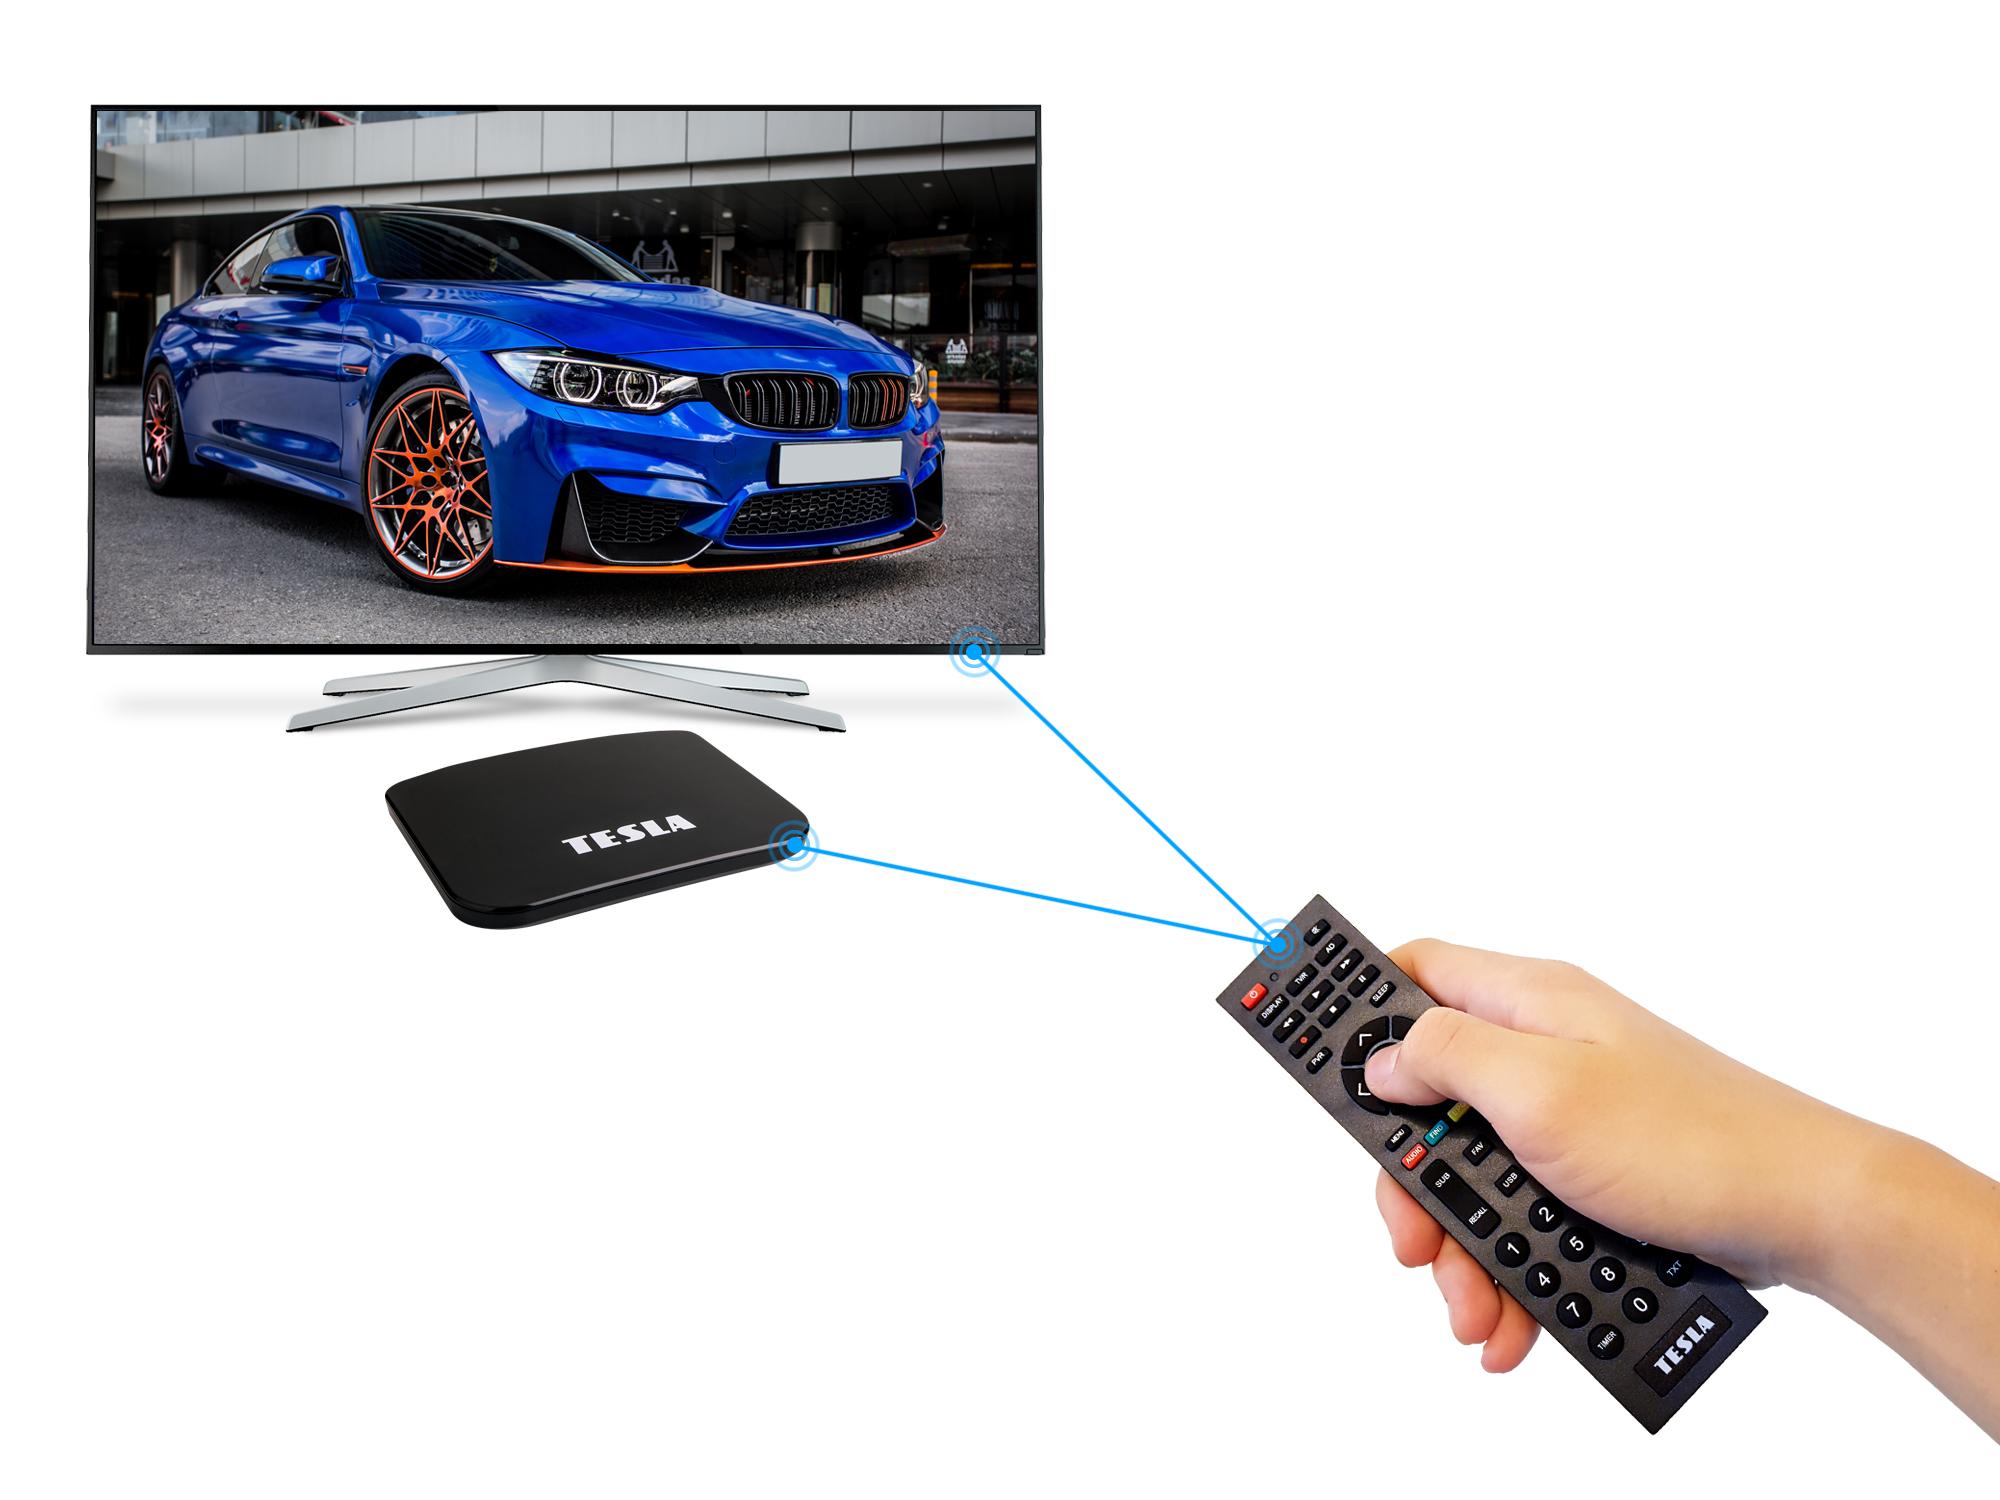 HDMI_CEC_vizualizace_TEH_500